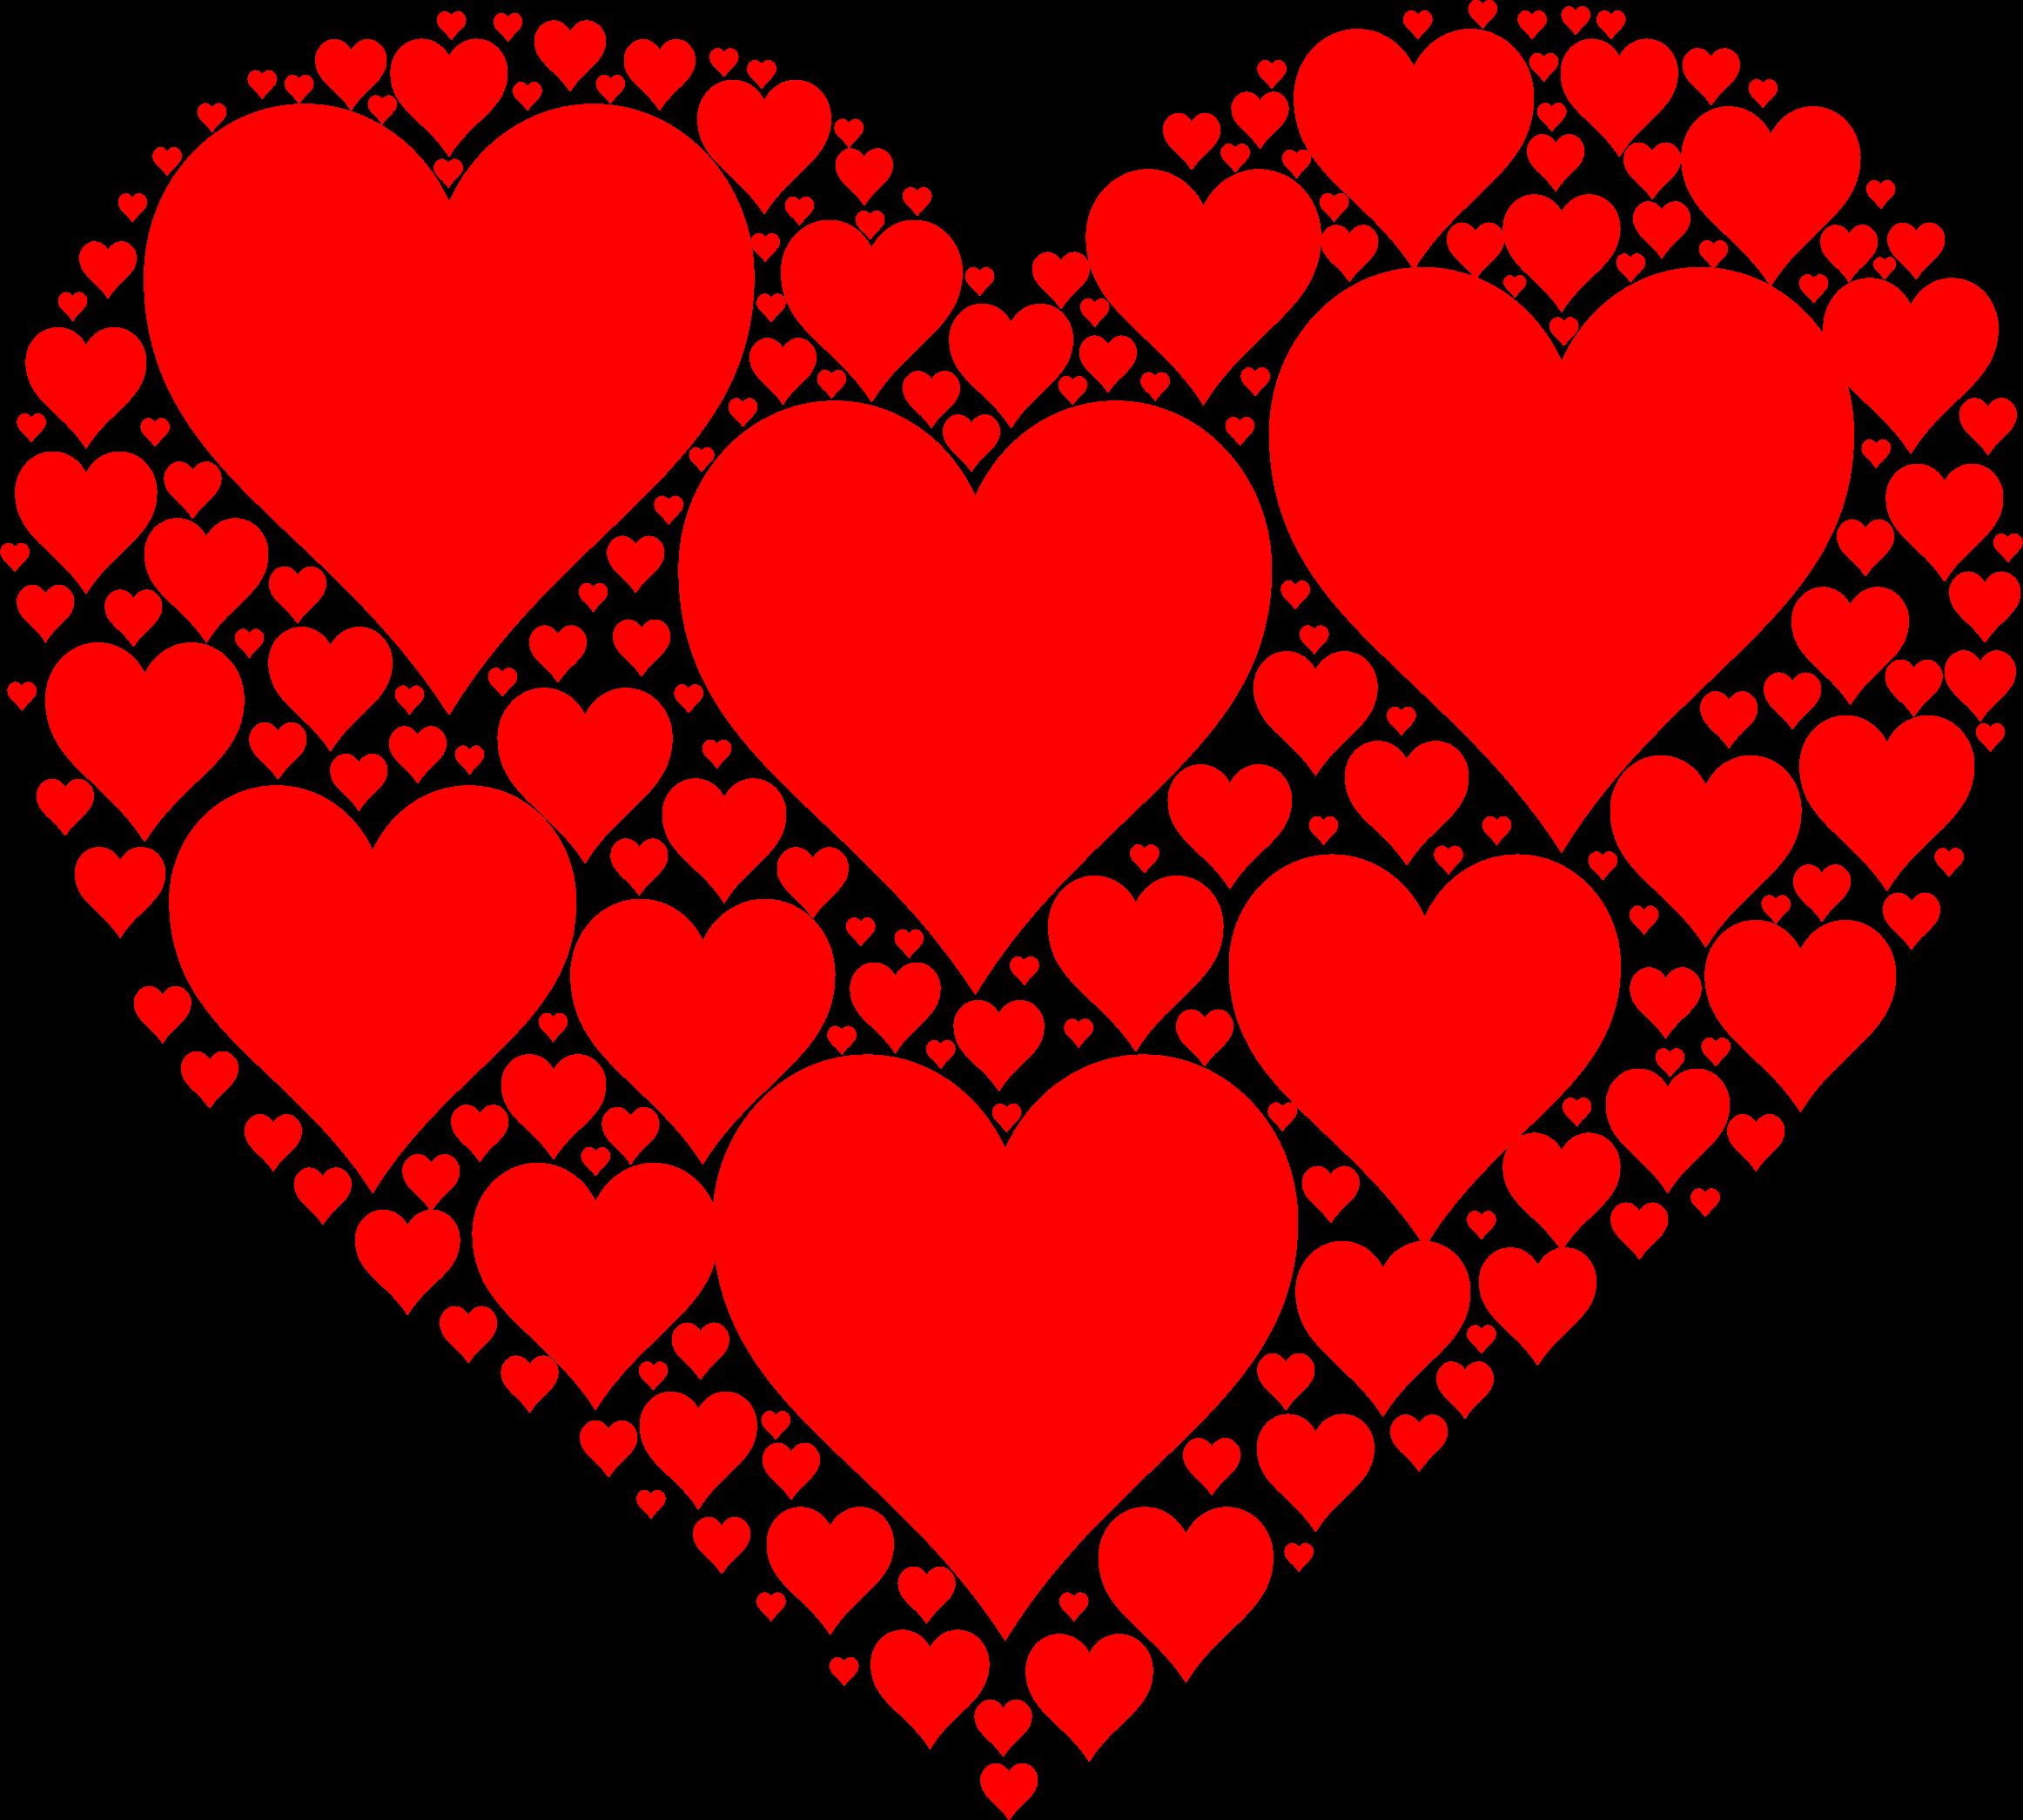 Hearts clipart wave. Pic of heart qygjxz